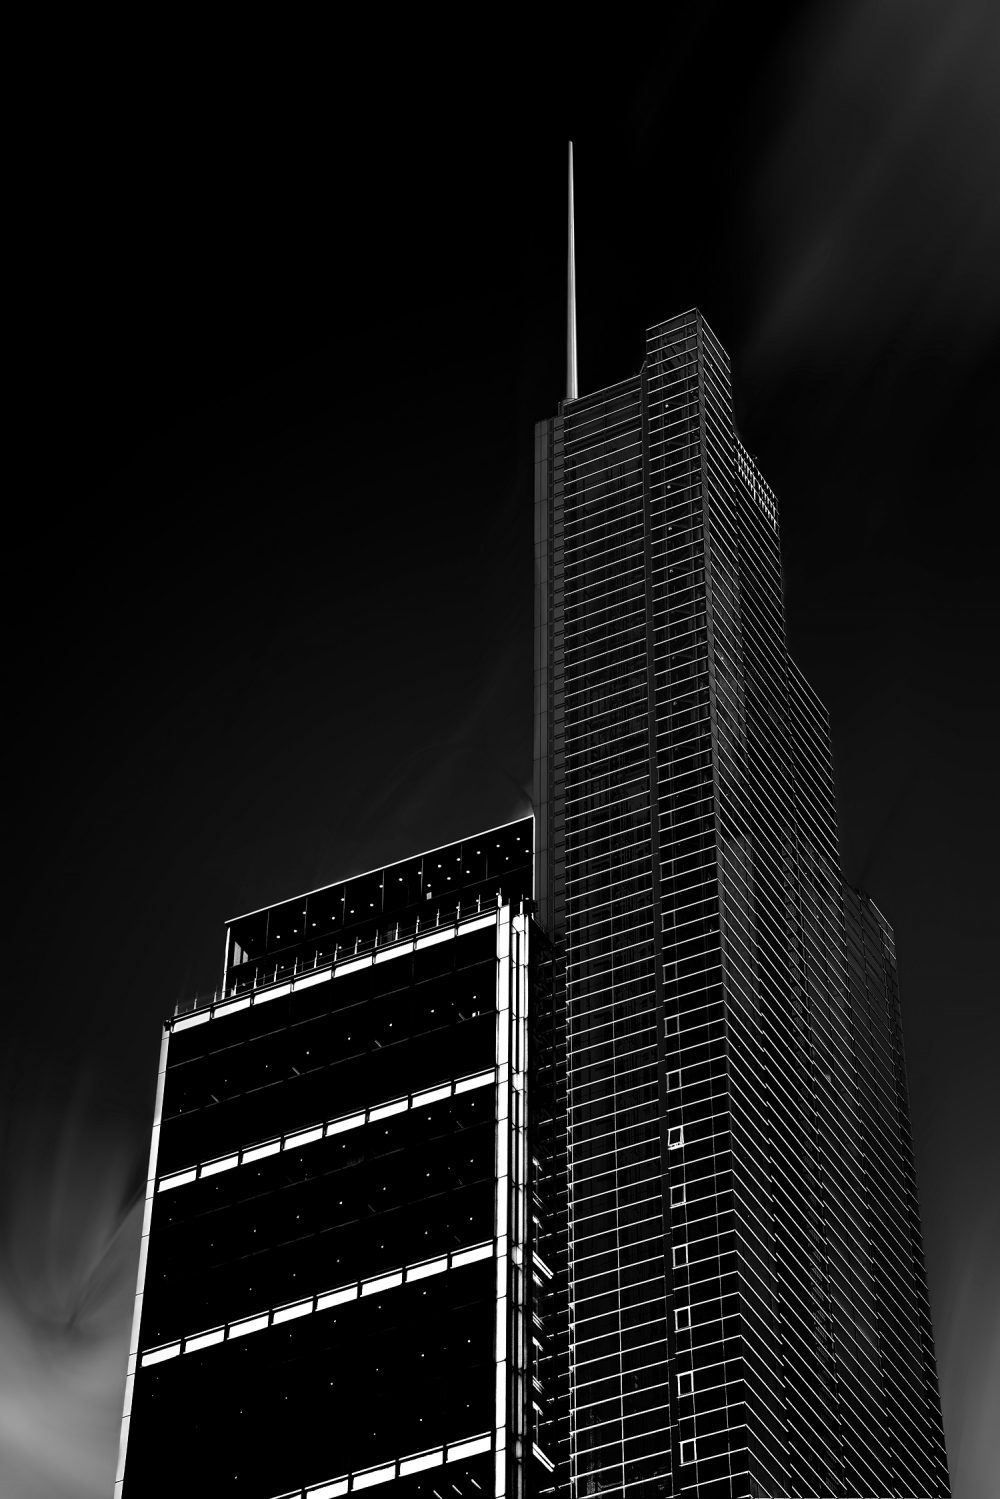 The Heron Building